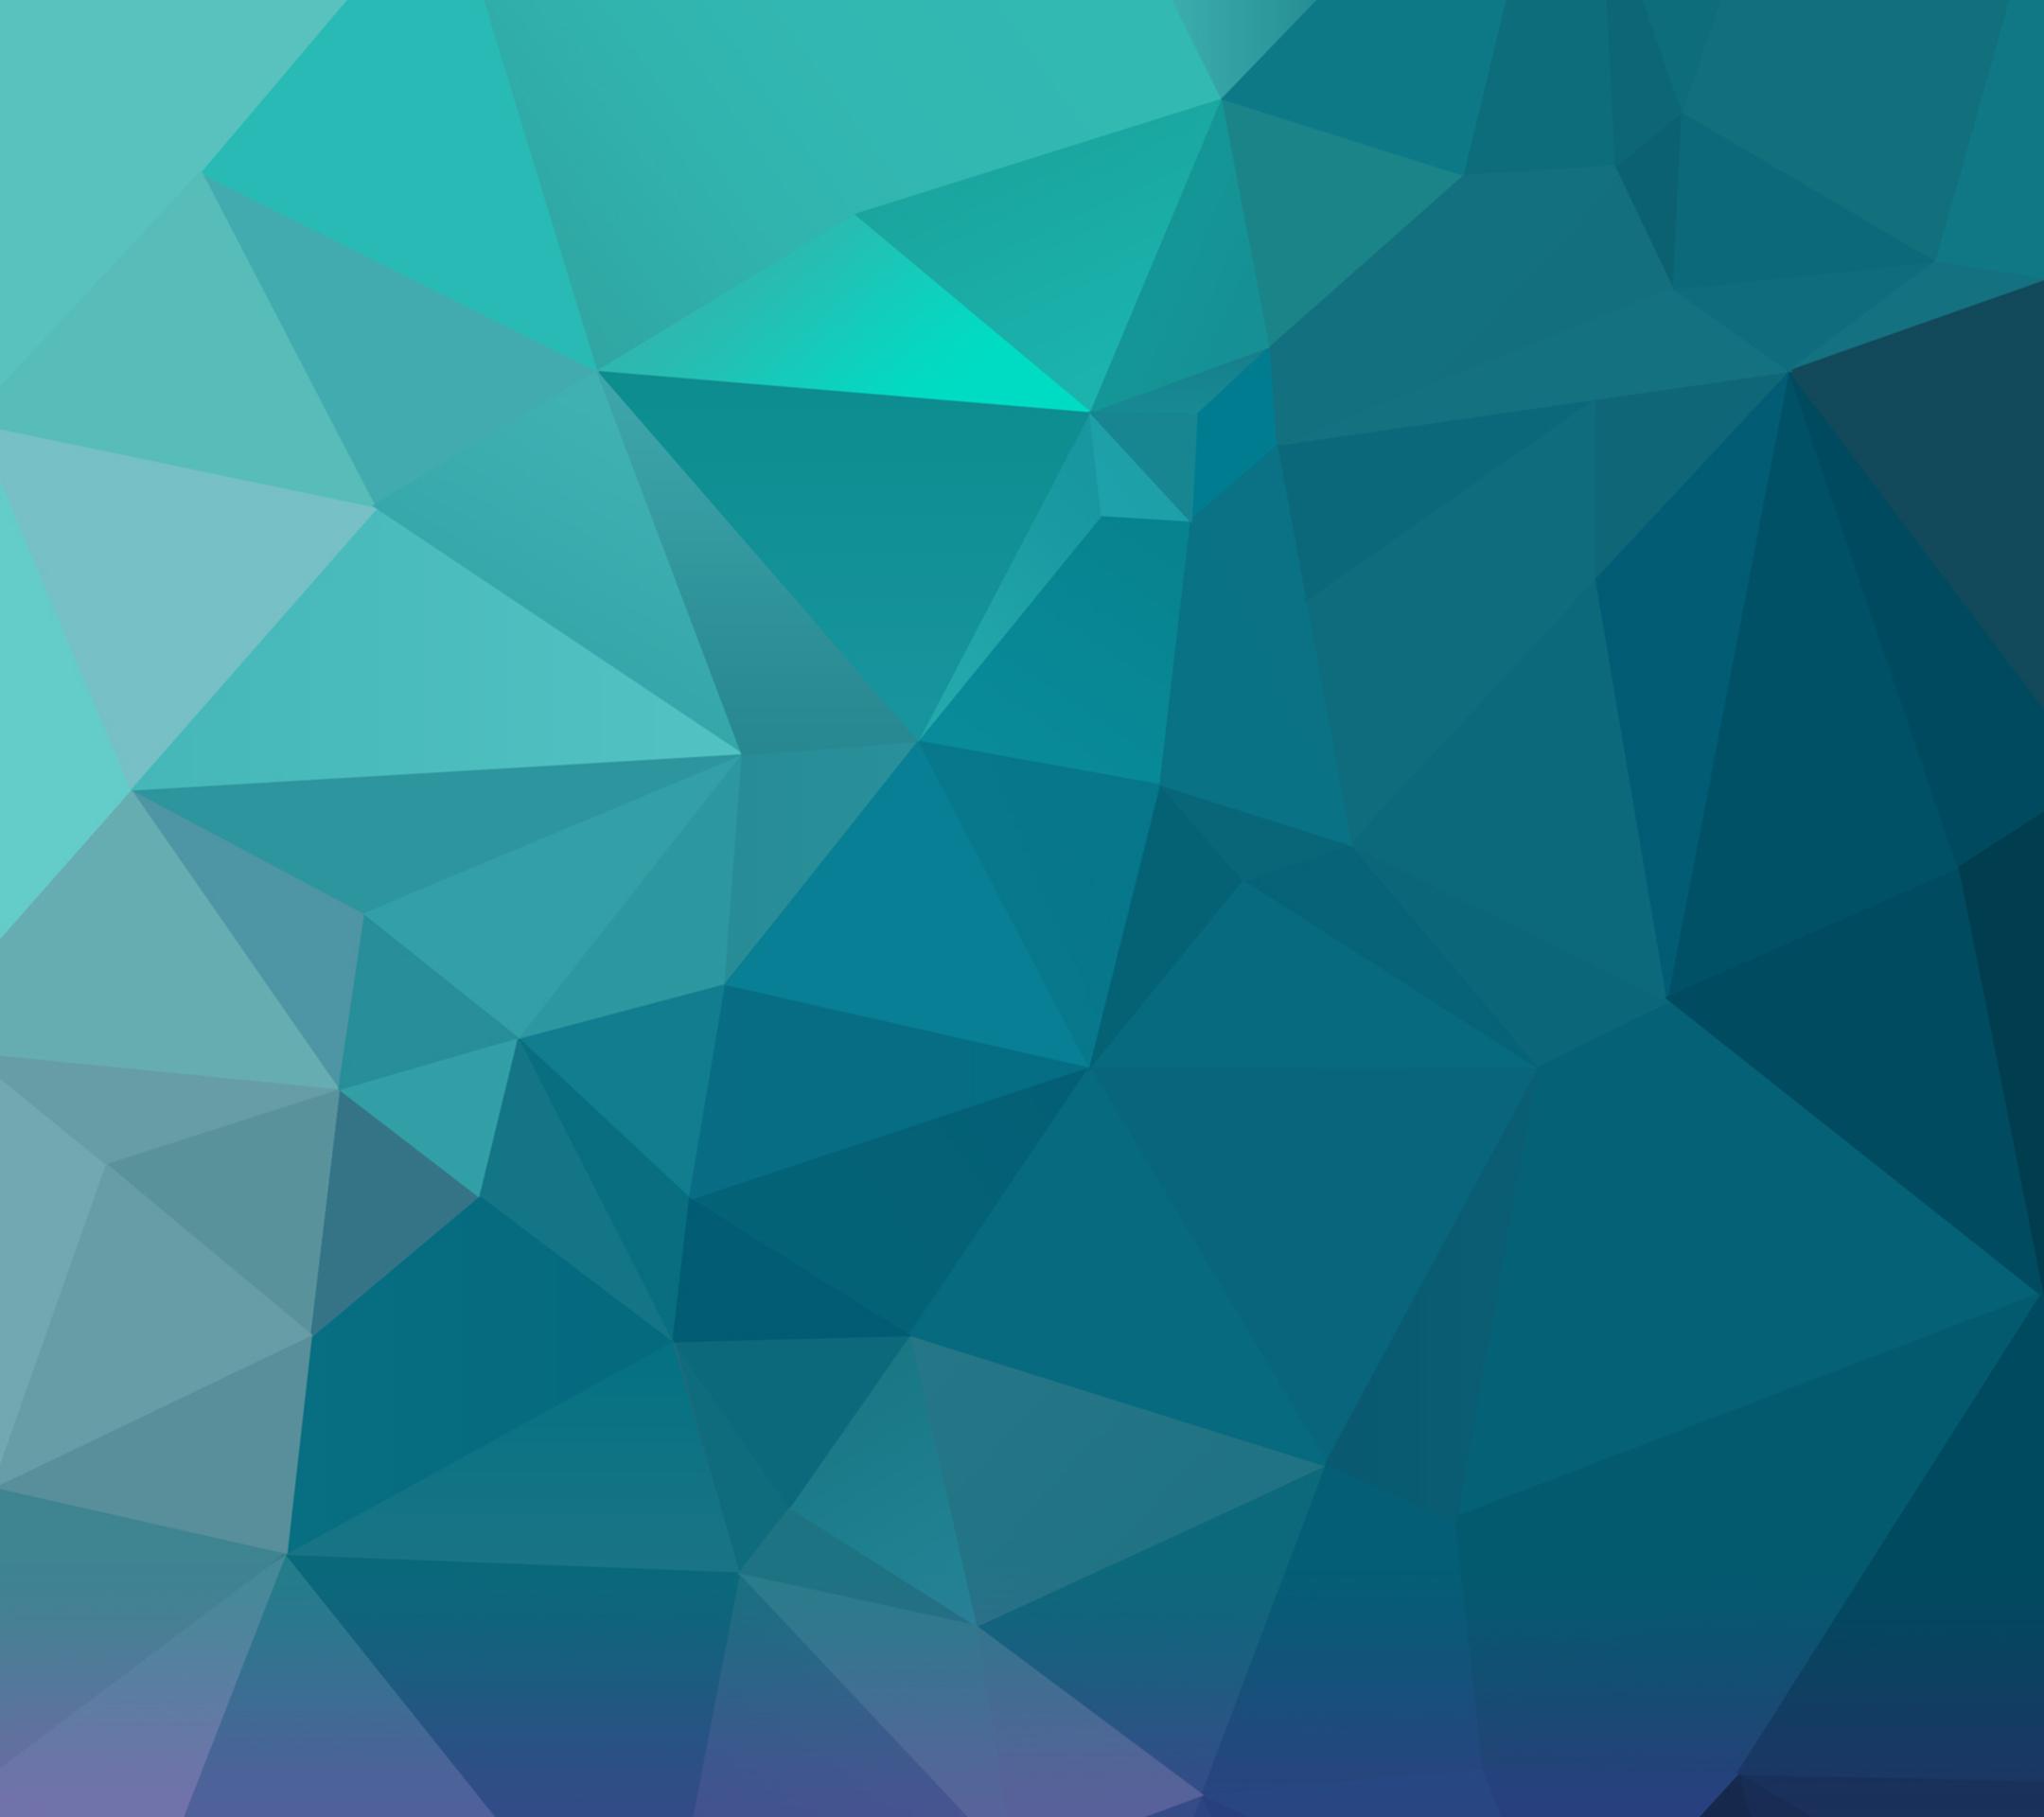 Galaxy S5 HD Wallpaper - WallpaperSafari